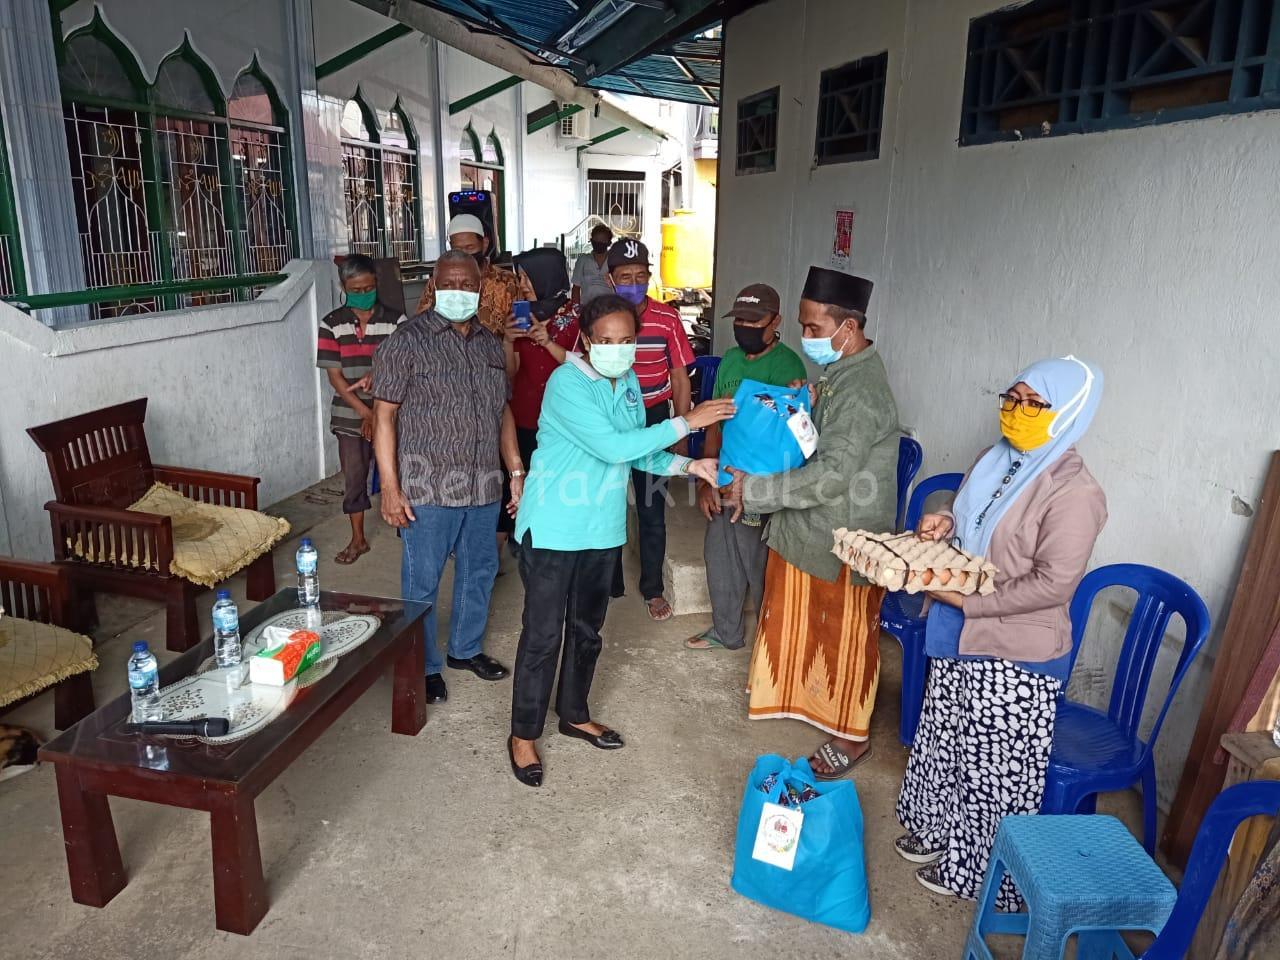 Lagi, Keluarga Mandacan -Kiriweno Serahkan 521 Paket Bama ke Ratusan Umat di Manokwari 26 IMG 20200418 WA0035